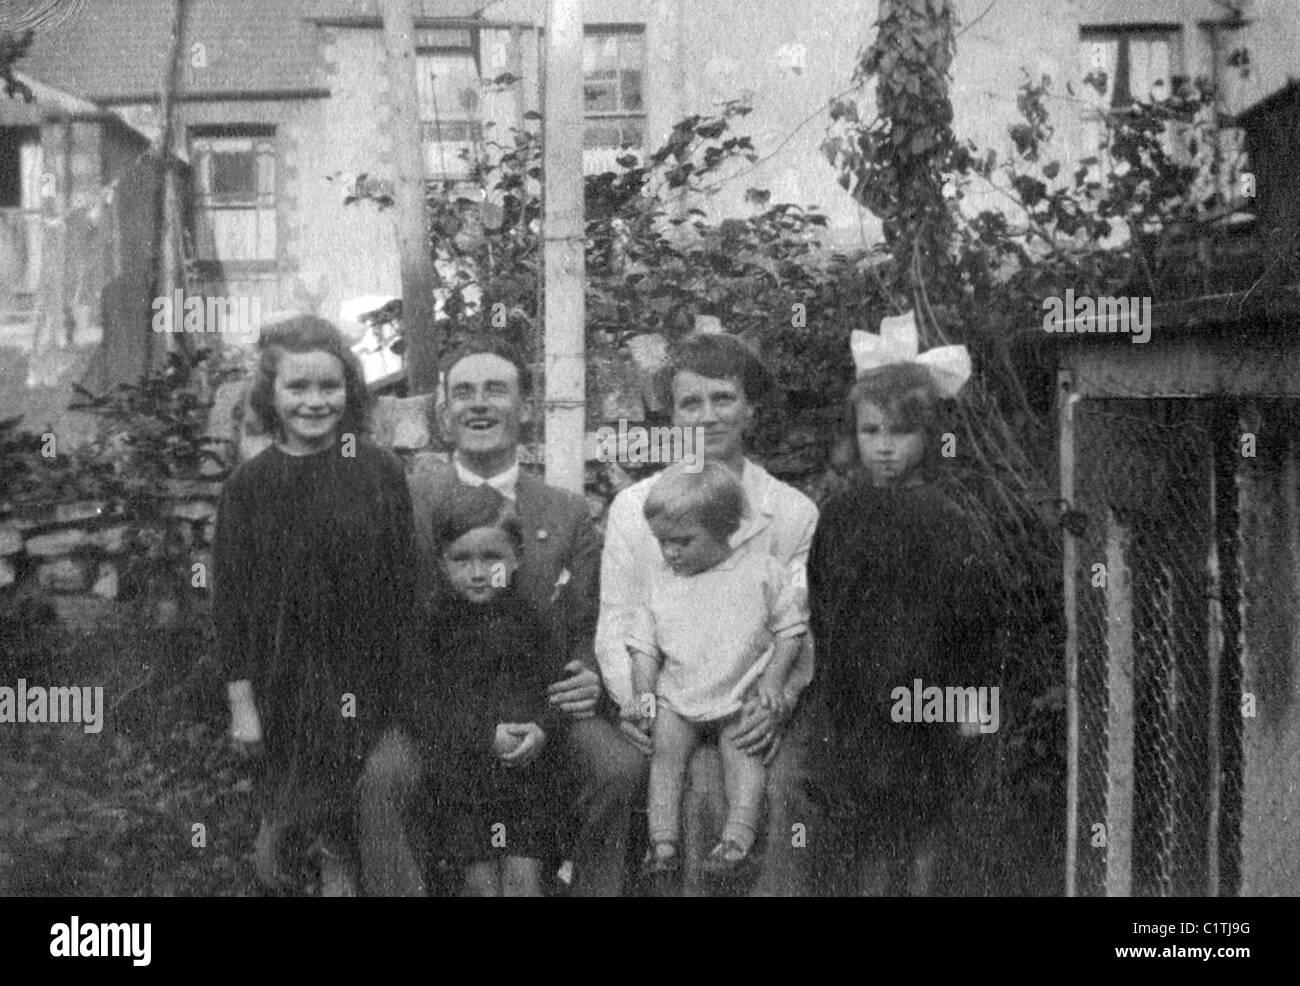 family-group-portrait-around-1920-cogan-